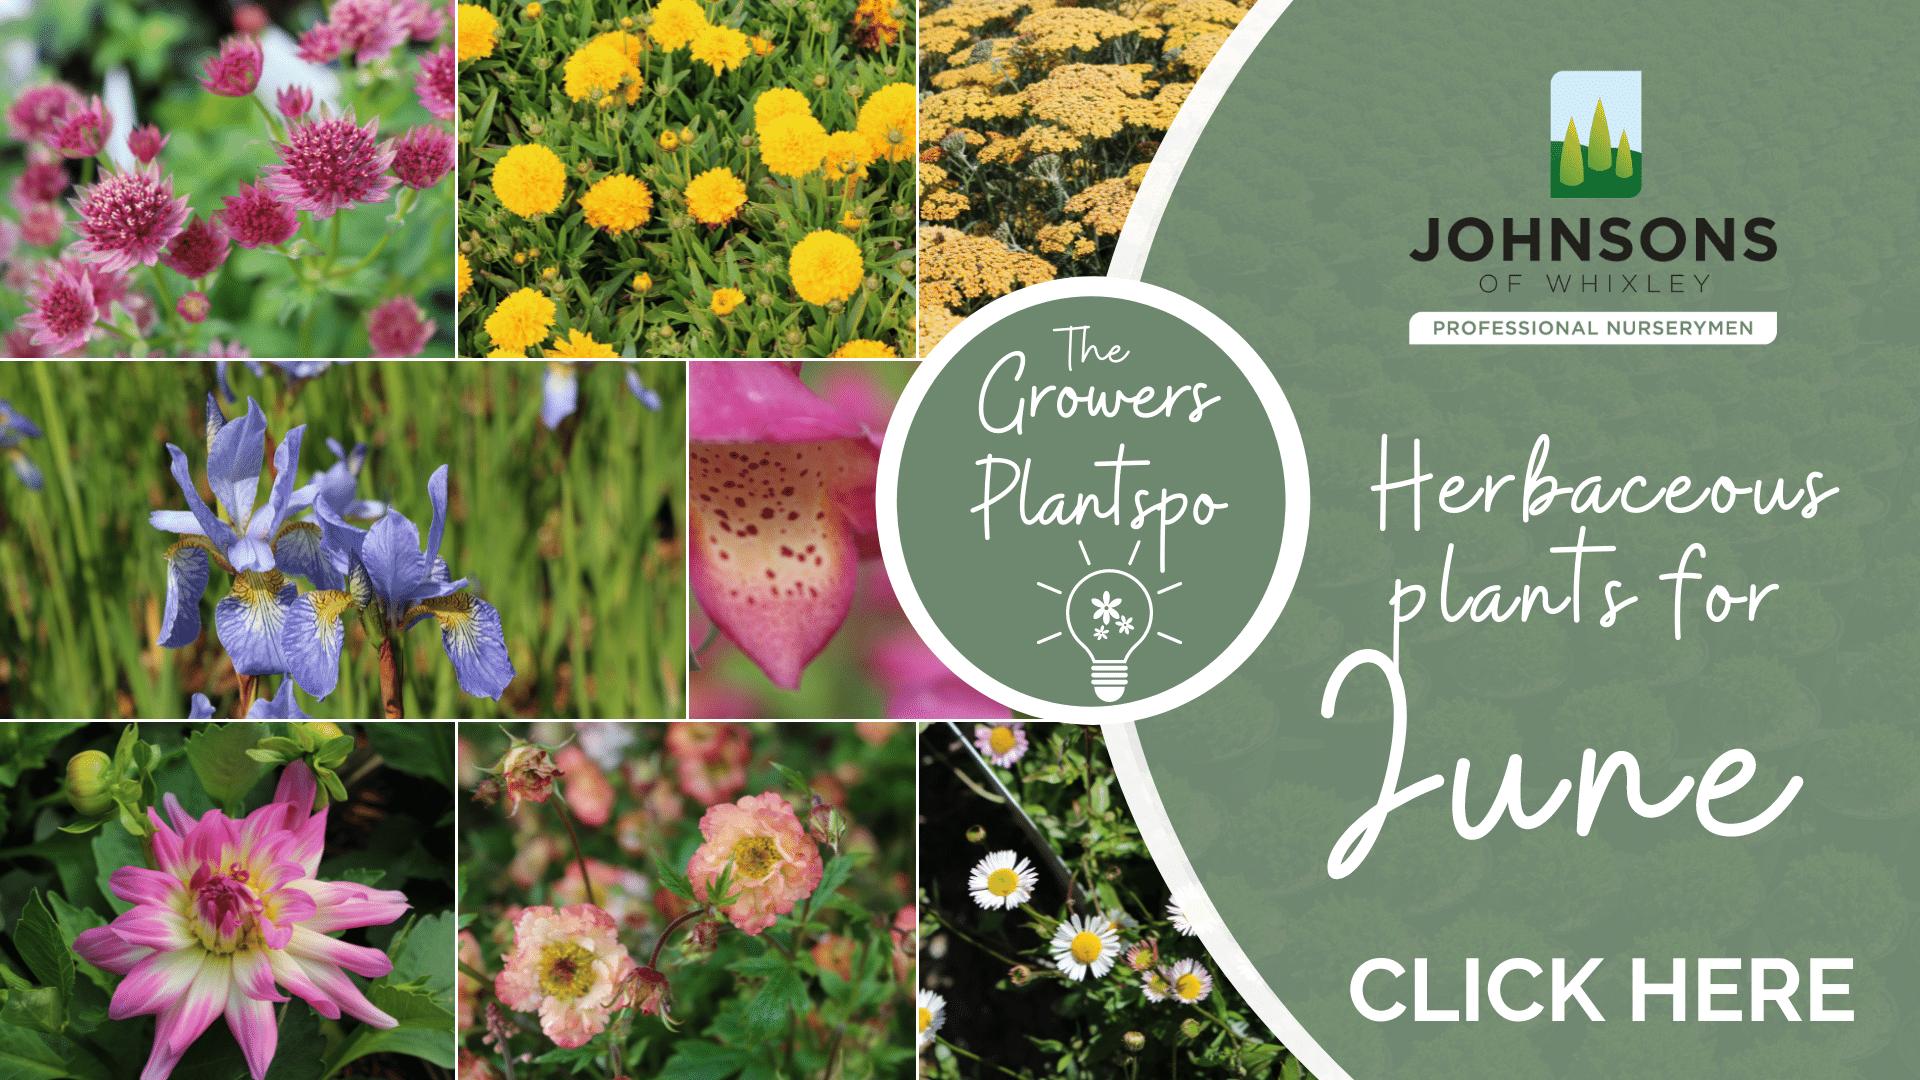 The Growers Plantspo - June Herbaceous